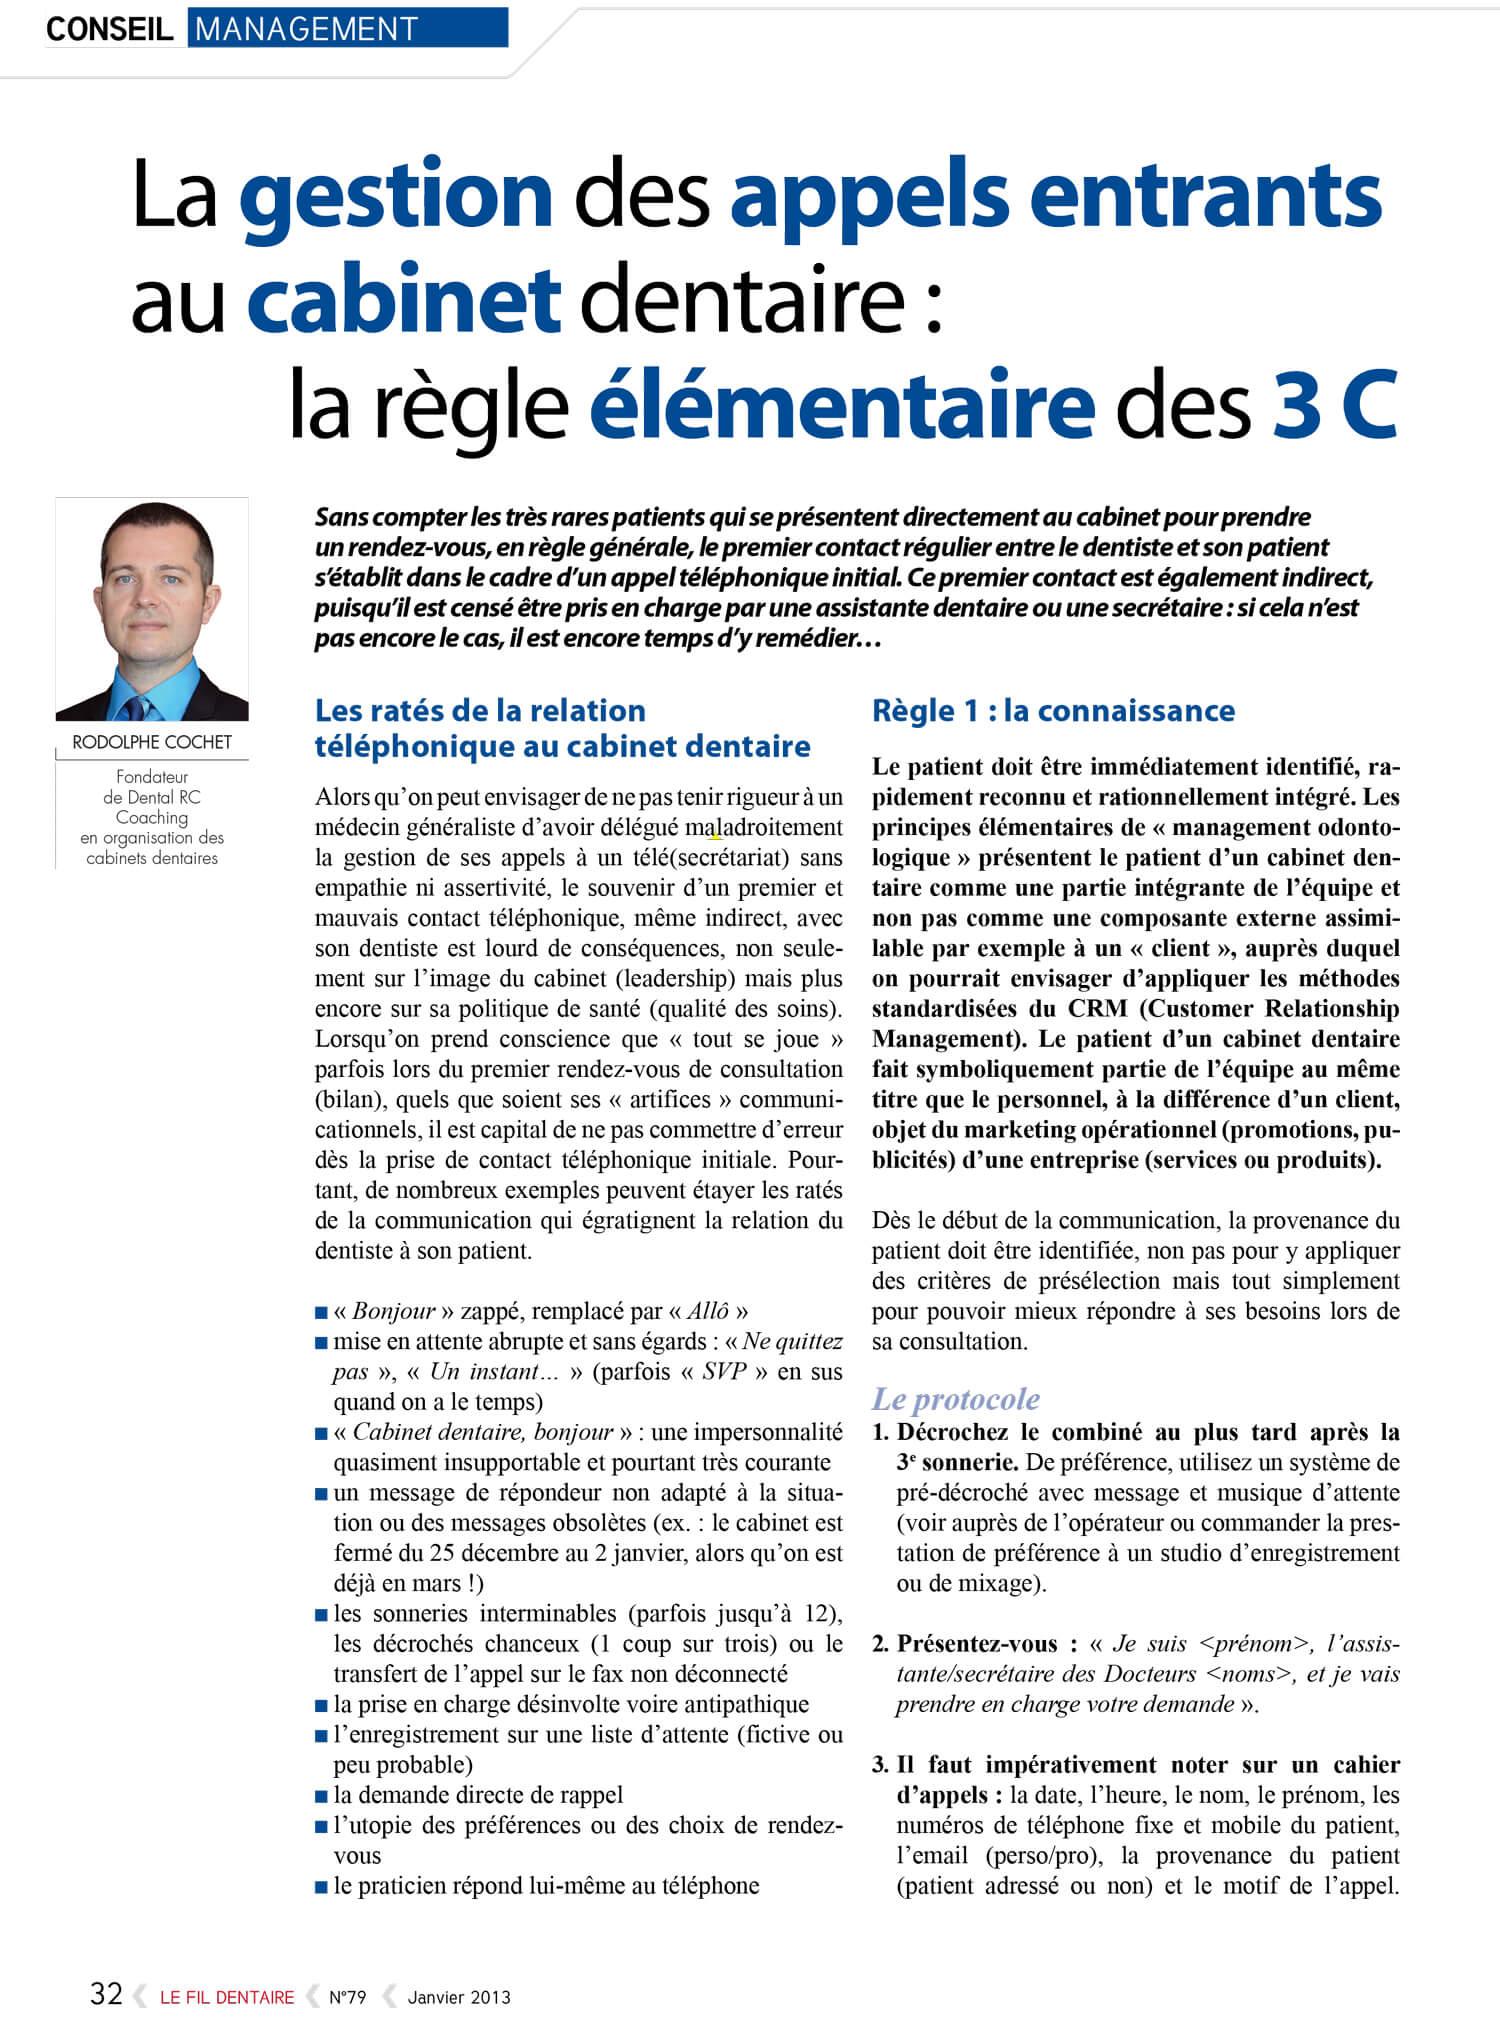 Gestion-agenda-cabinet-dentaire-Rodolphe-Cochet.jpg